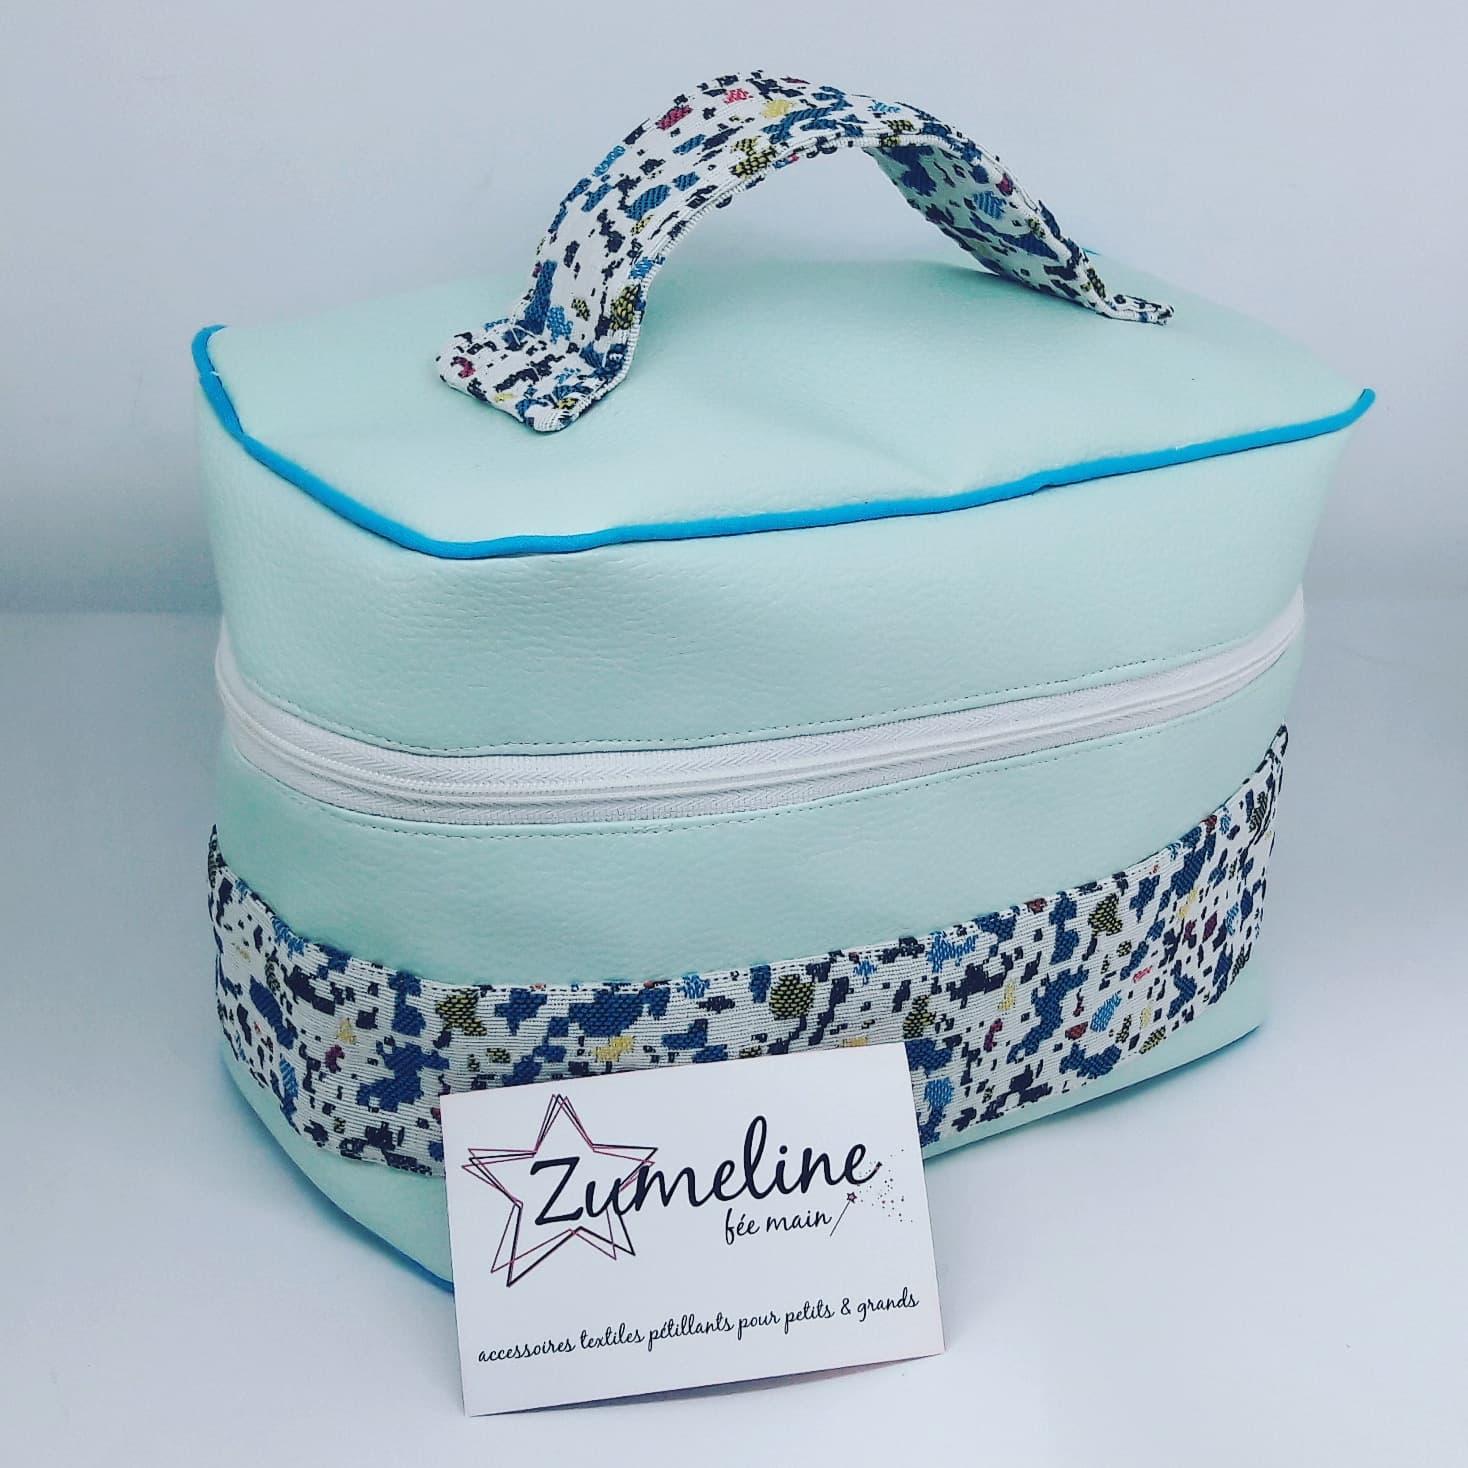 atelier_couture-juvisy-essonne-zumeline-vanity